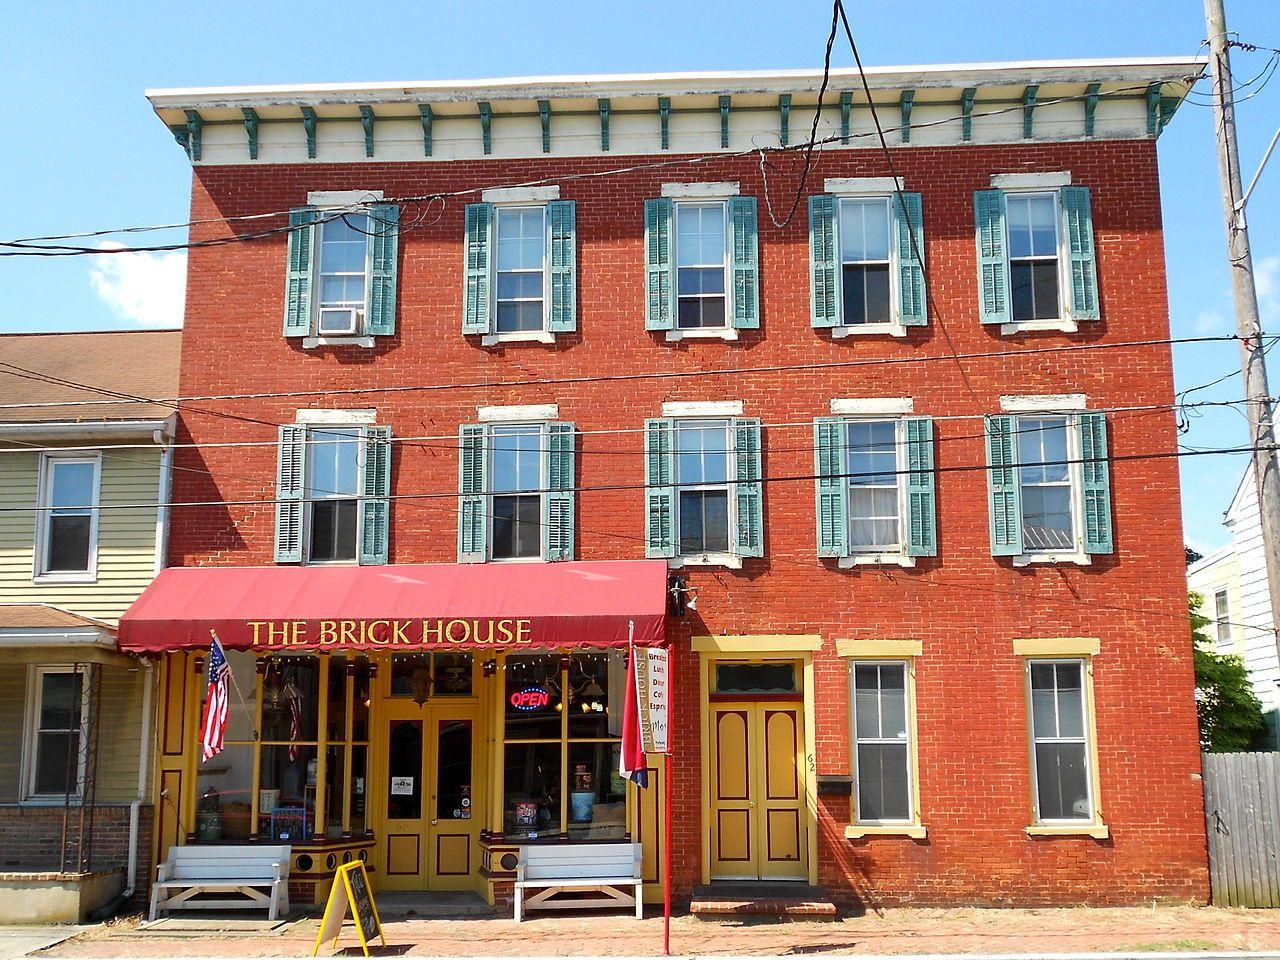 Manheim Borough Historic District in Lancaster County, Pennsylvania.